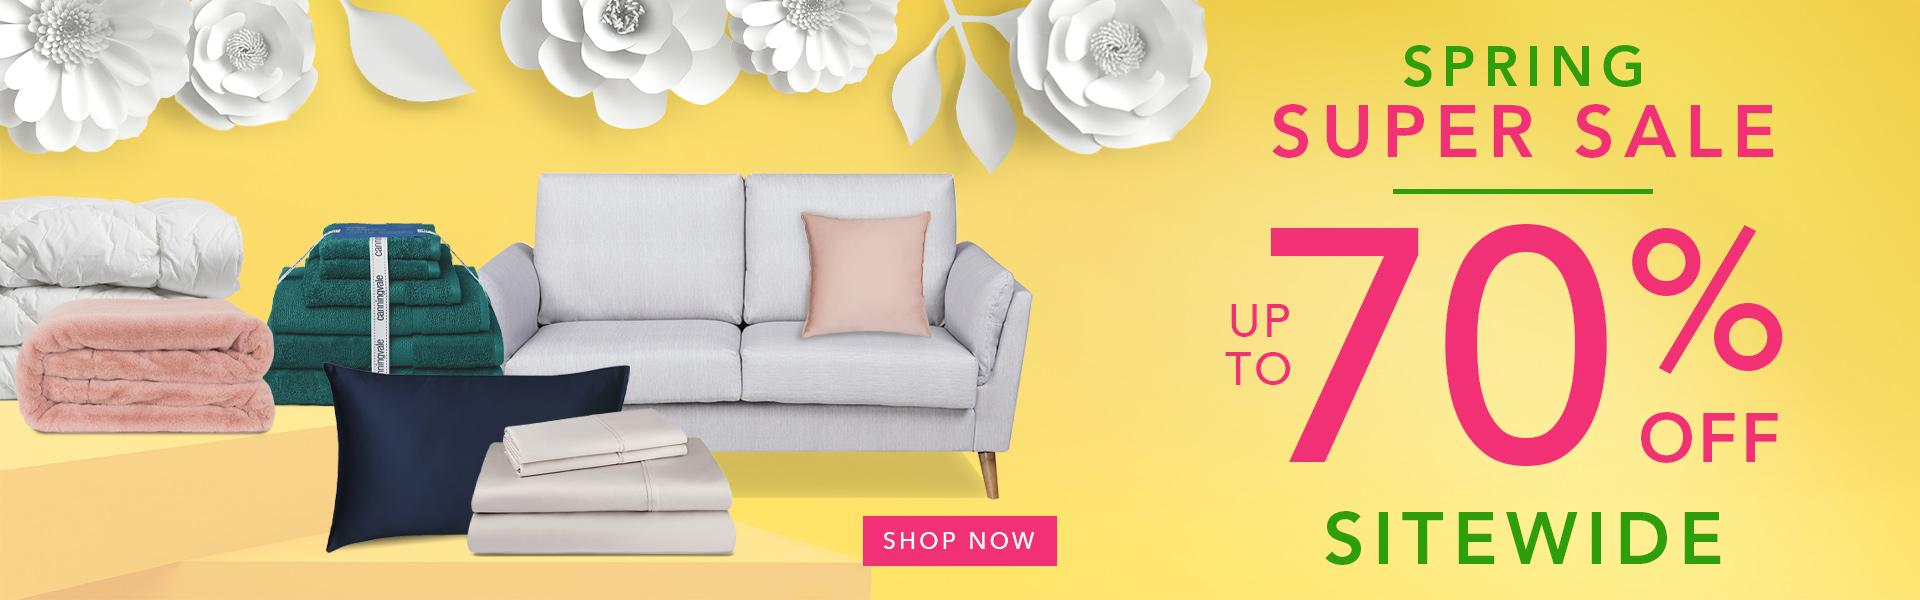 Spring Super Sale Homepage Banner